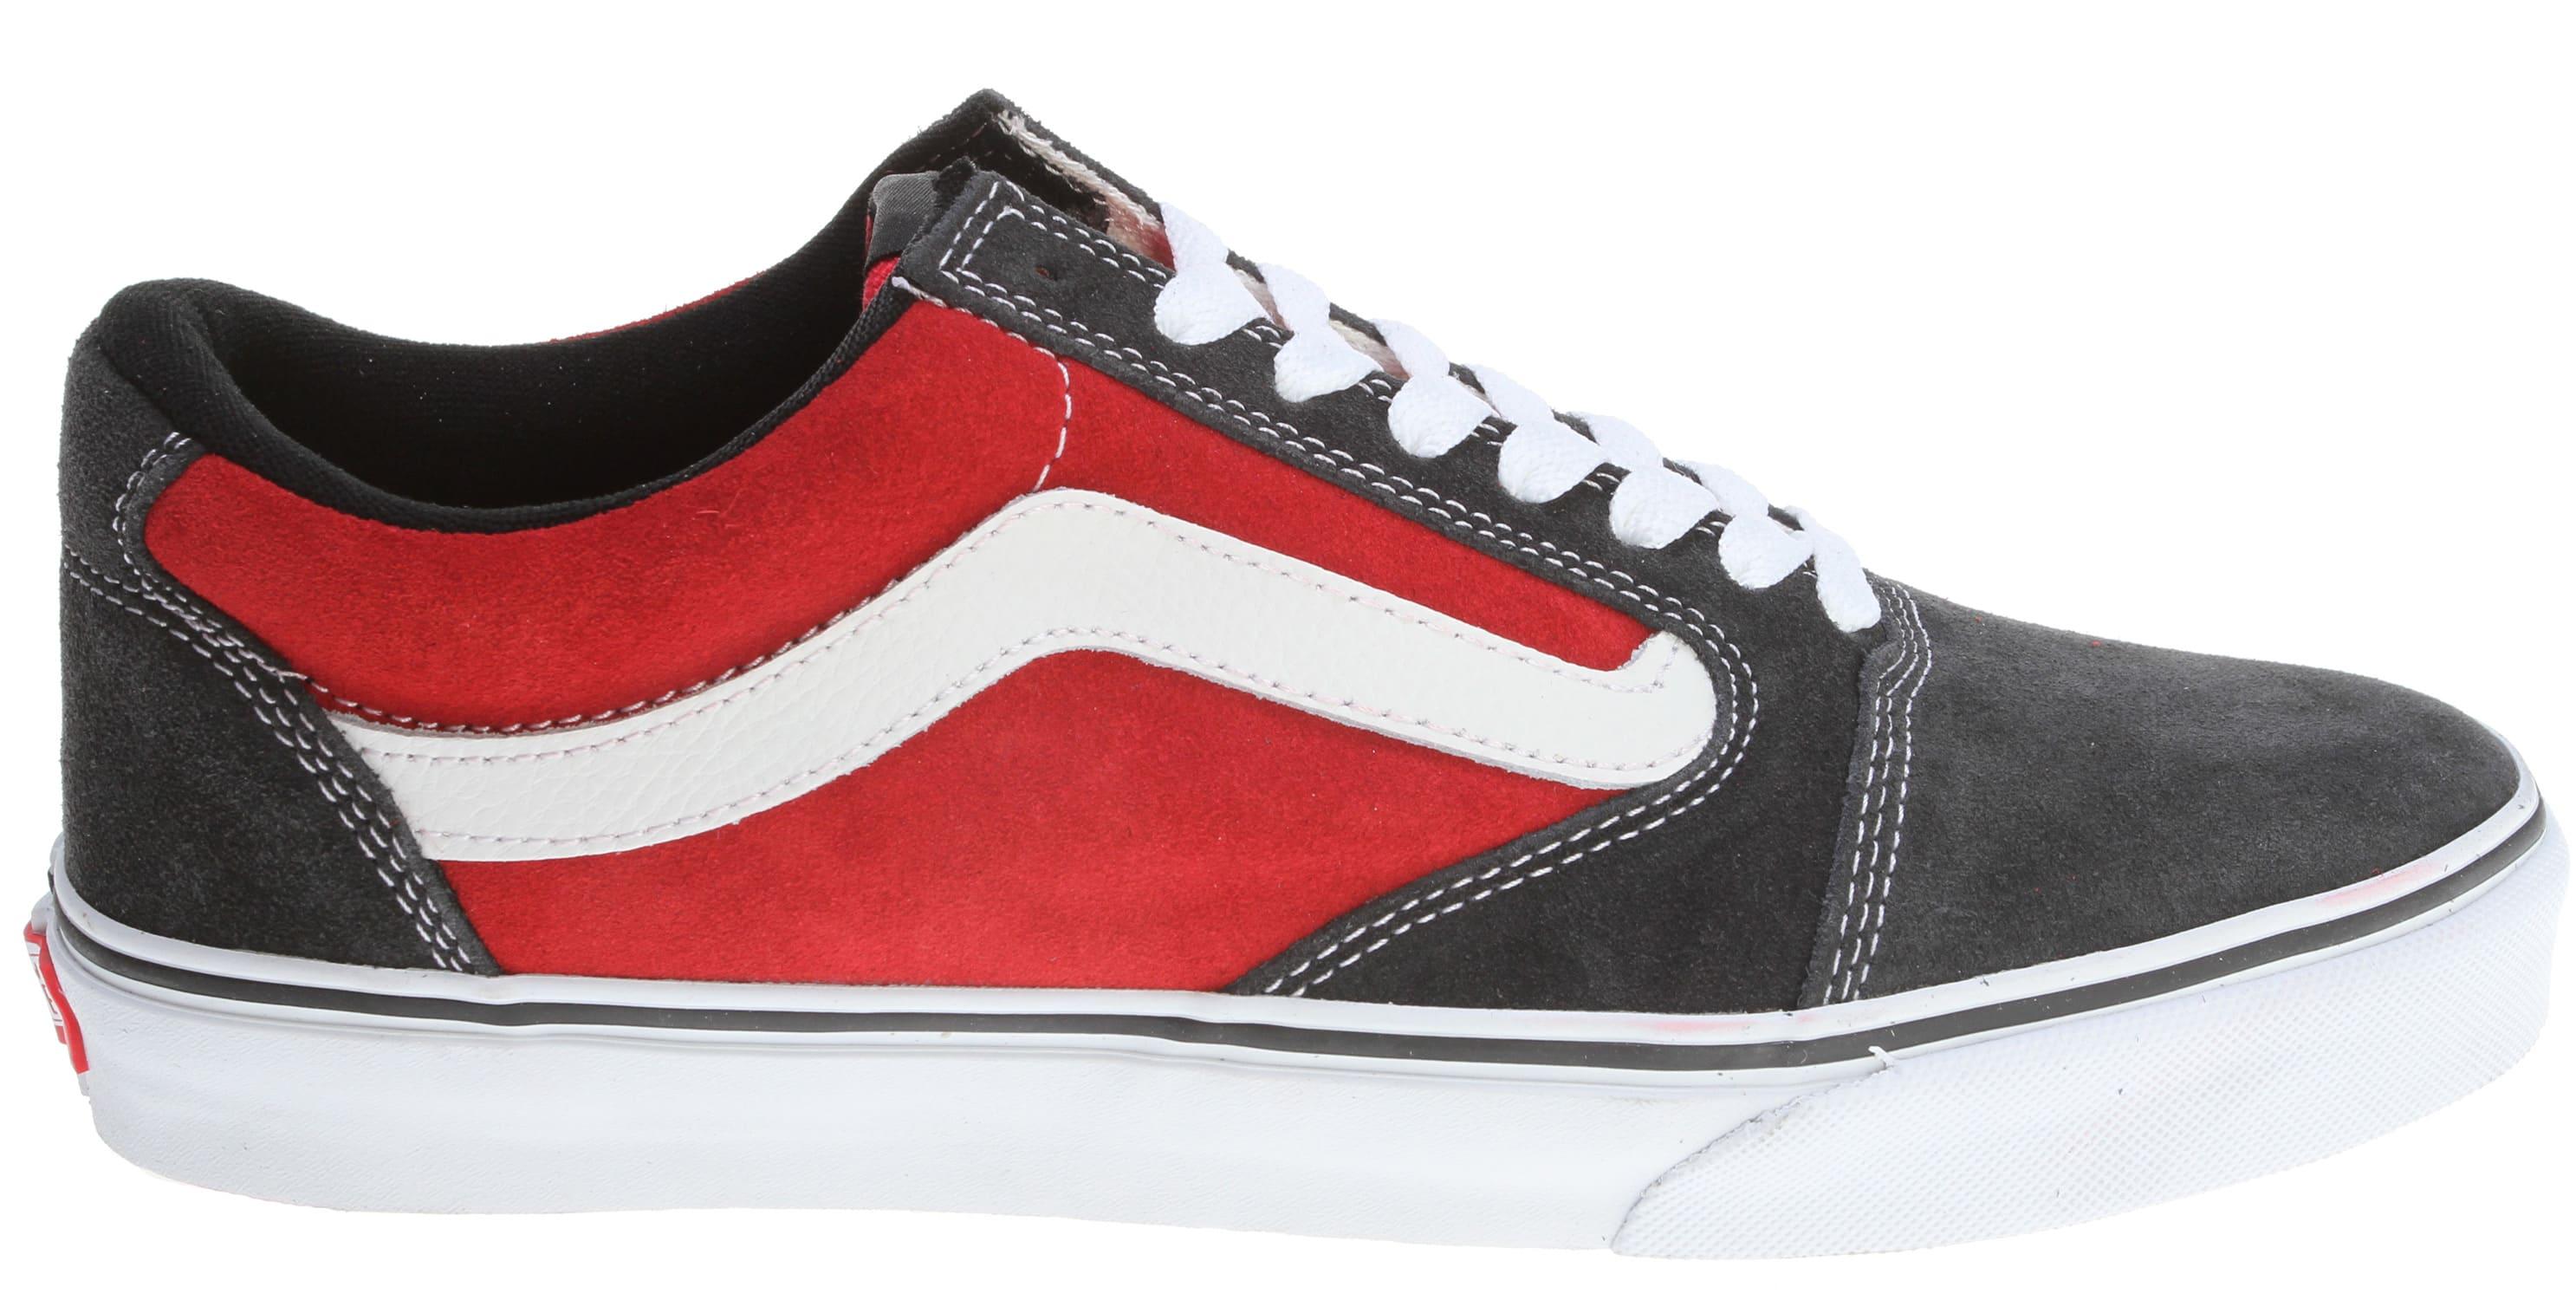 bb6320119a Vans TNT 5 Skate Shoes - thumbnail 1